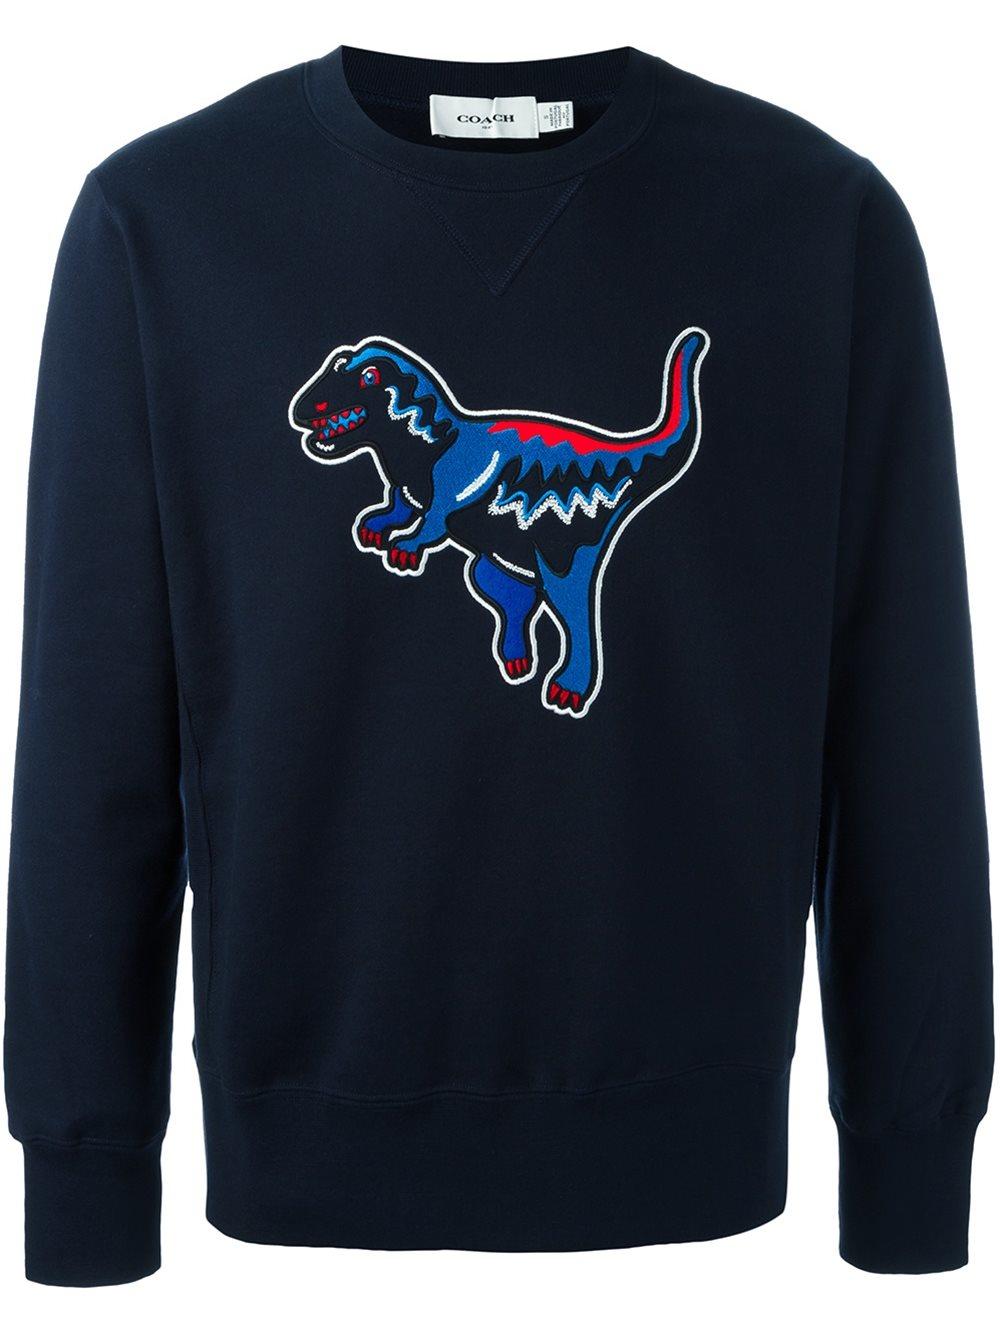 Lyst Coach Dinosaur Patch Sweatshirt In Blue For Men